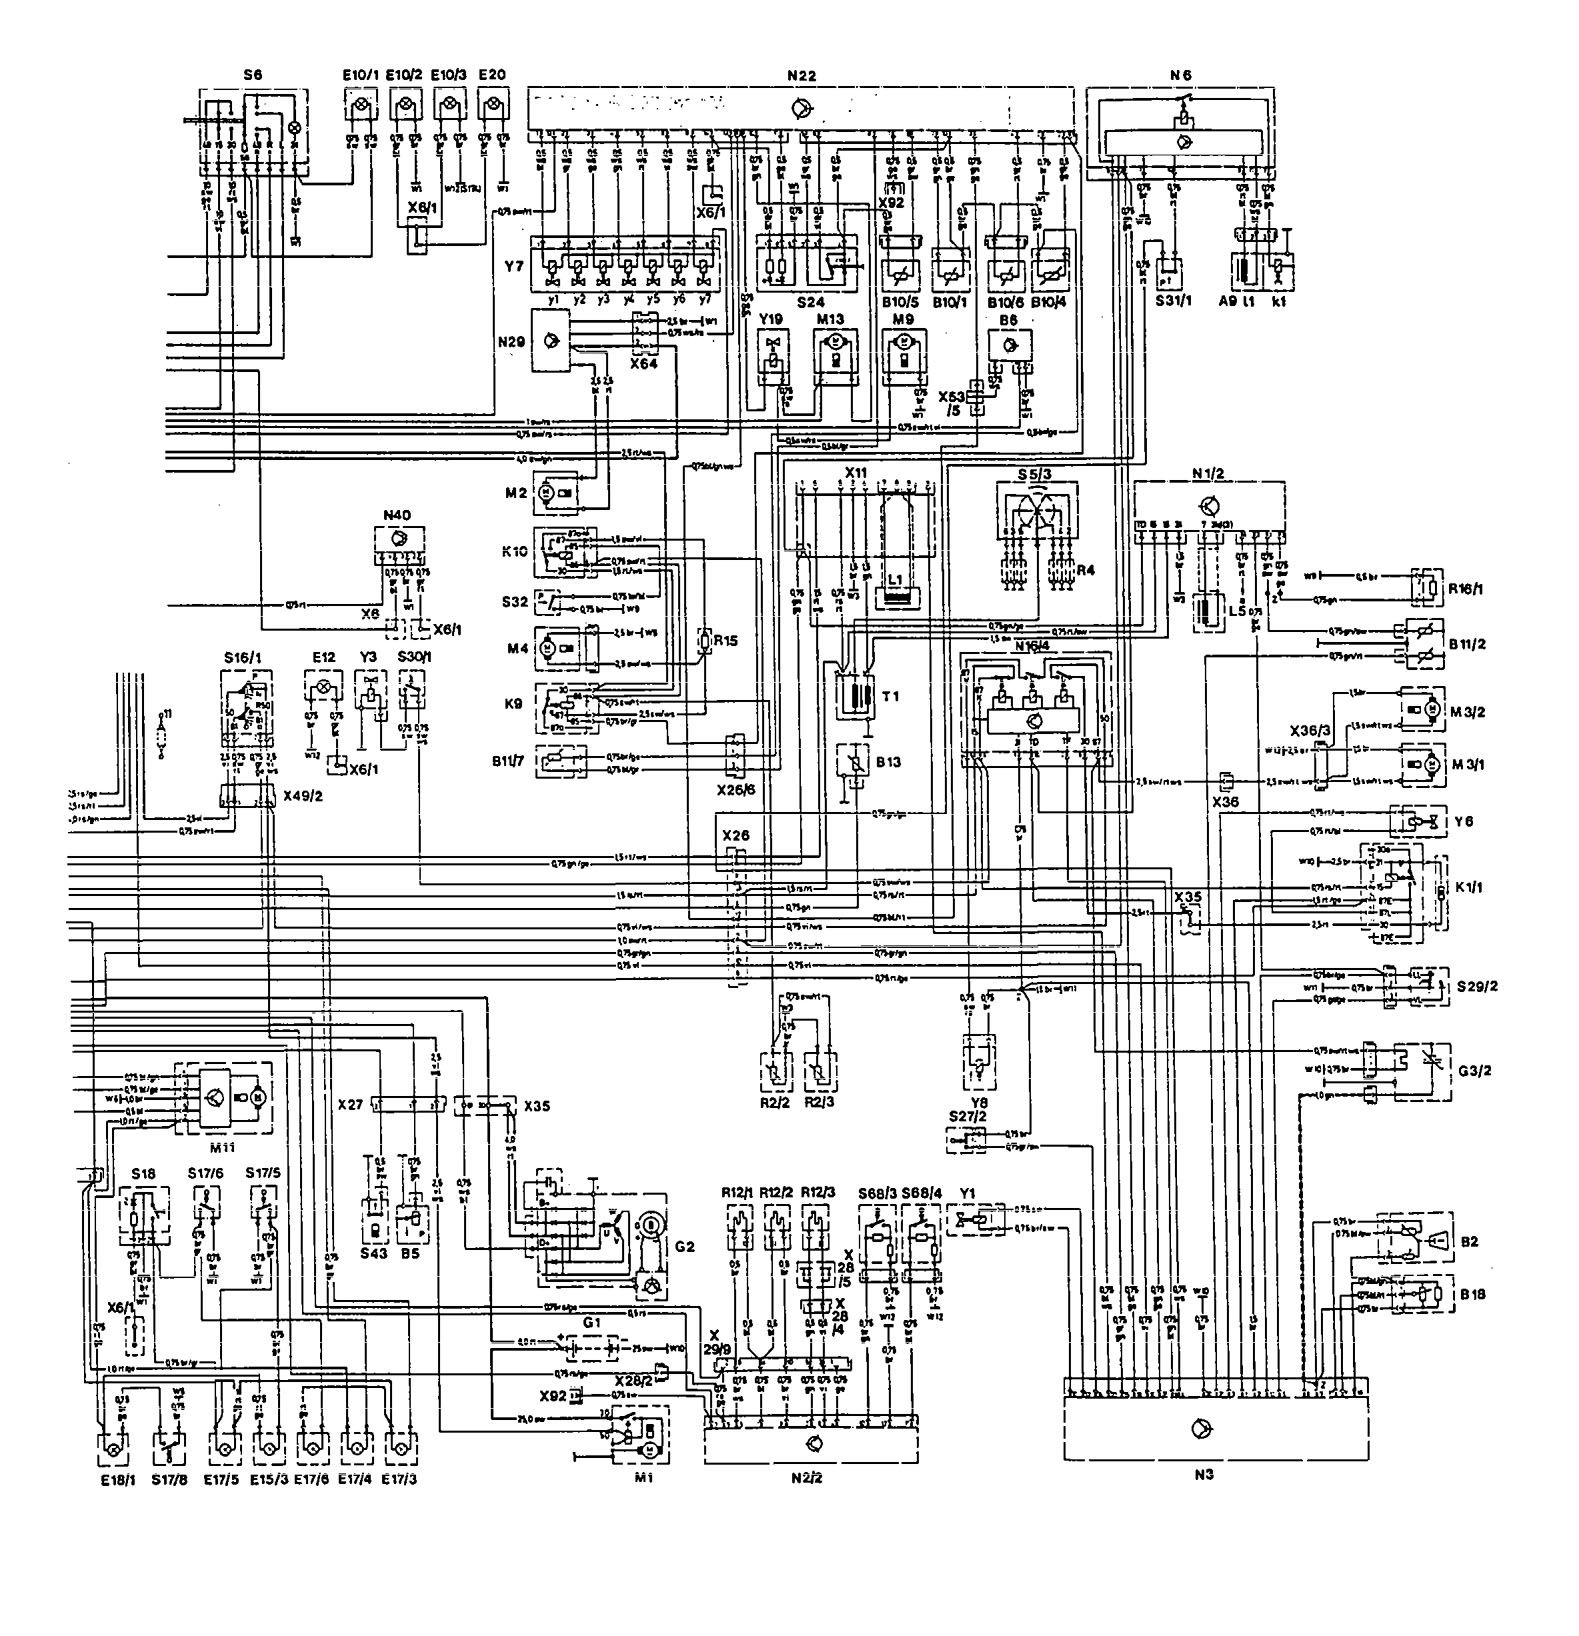 Mercedes Benz 500e 1992 1993 Wiring Diagrams Cooling Fans Fan Diagram